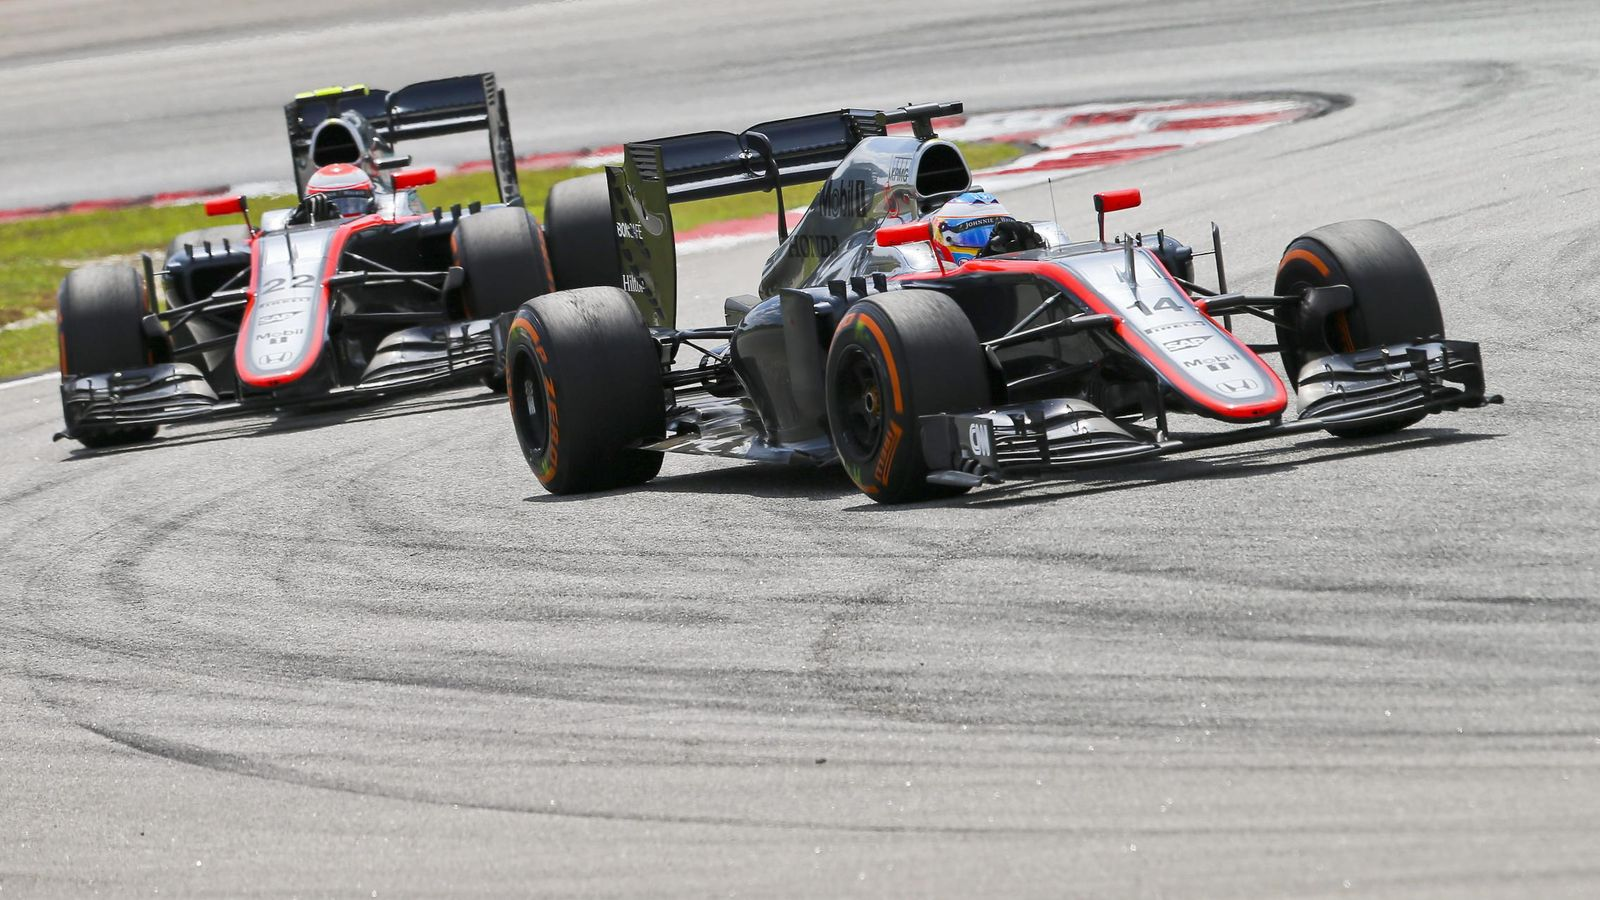 Foto: Fernando Alonso y Jenson Button en la pista de Sepang.